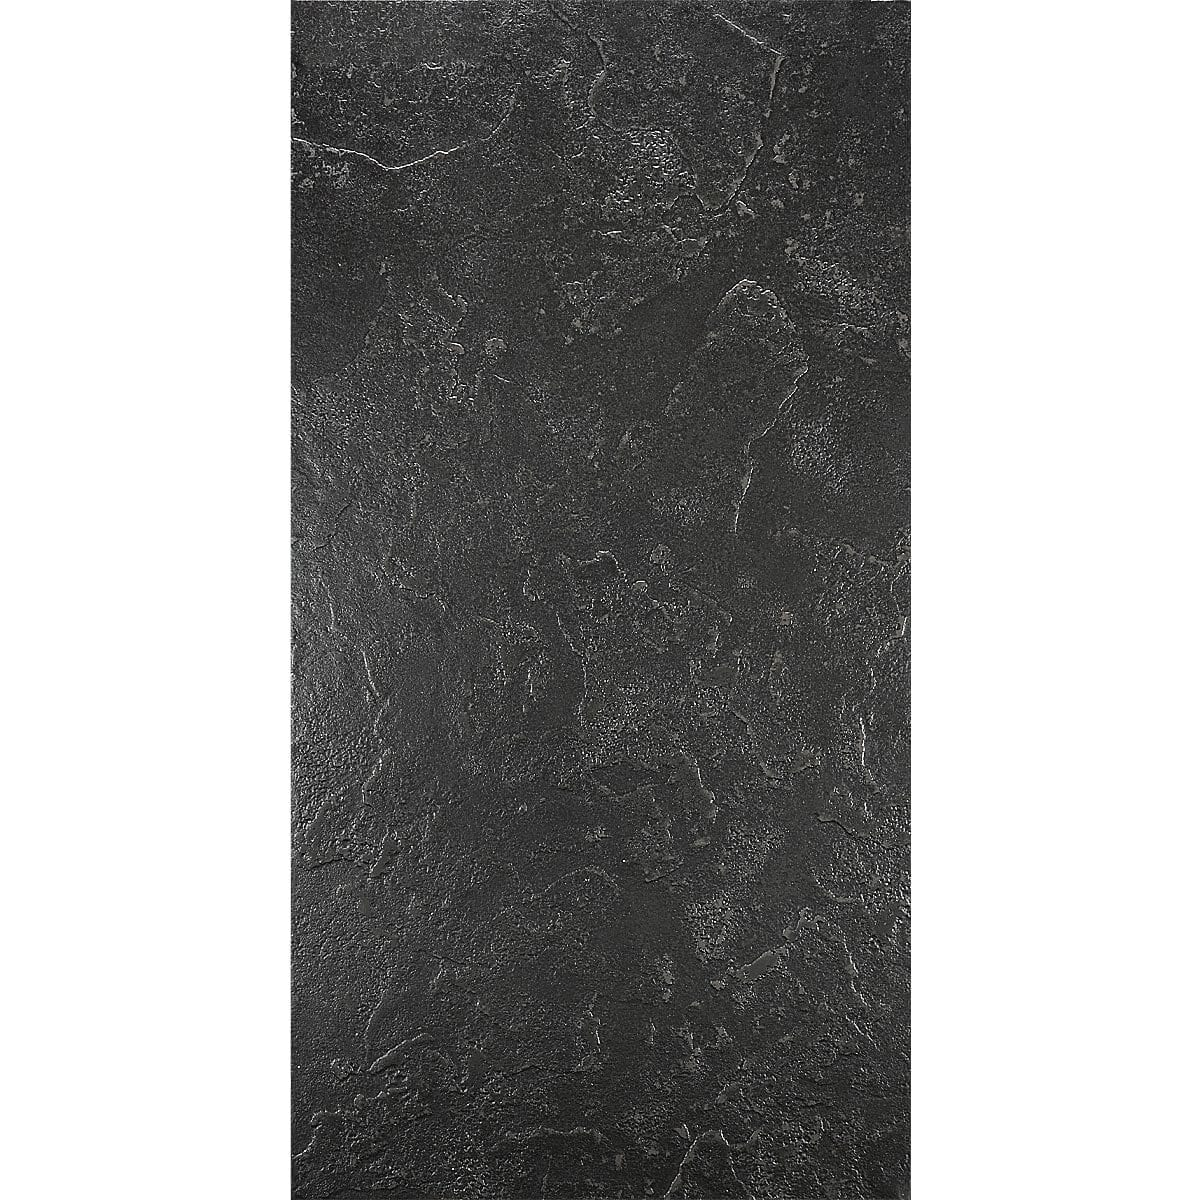 GUSTO STONE BLACK T10408 P1